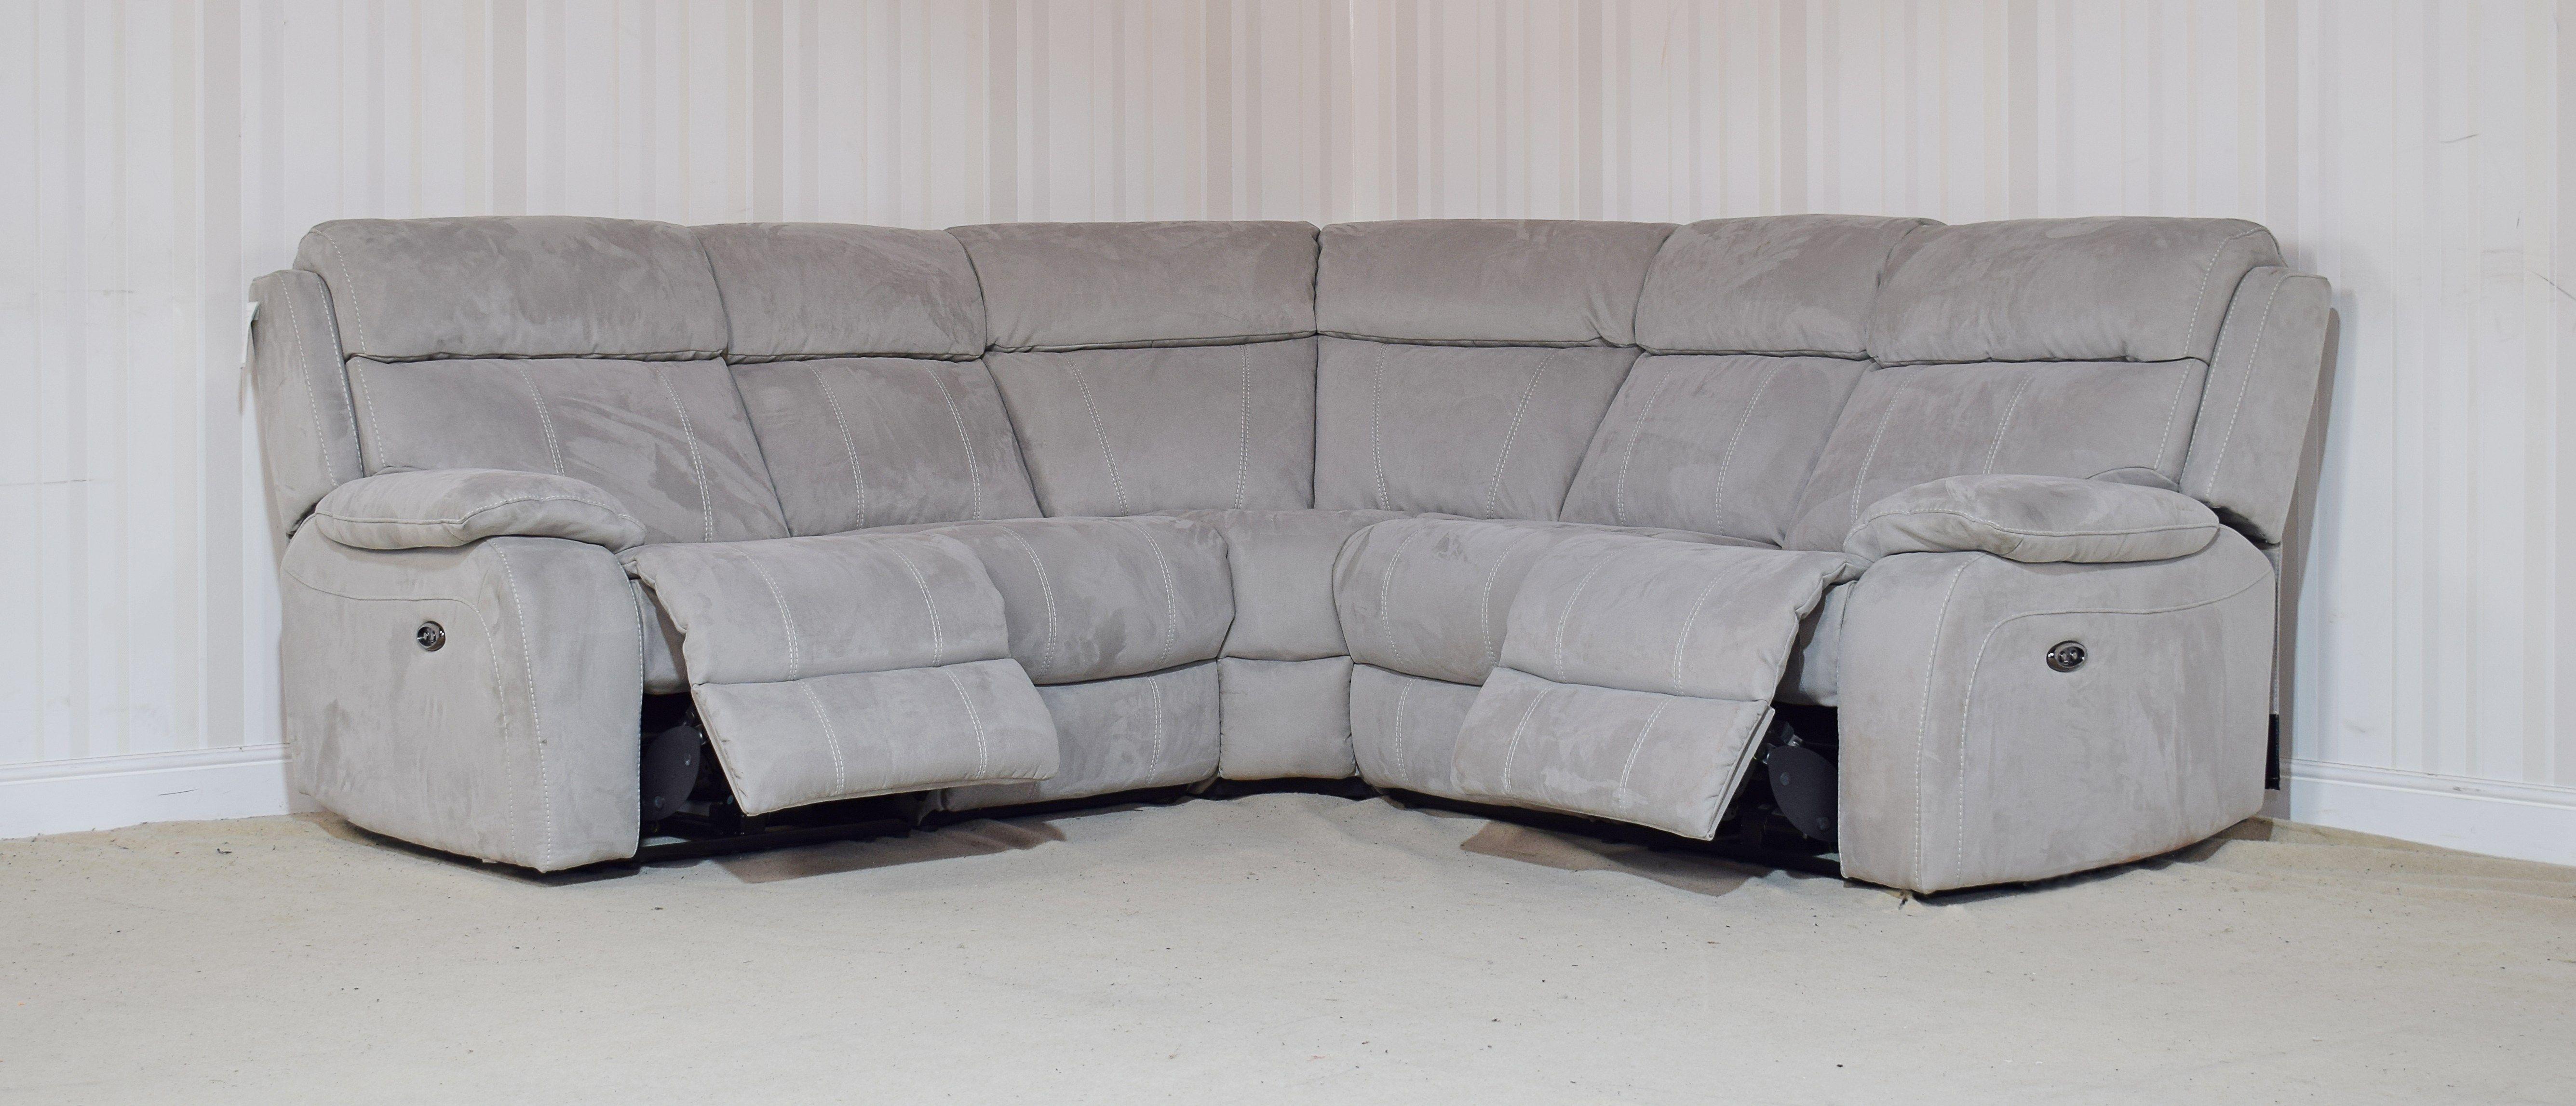 Moreno Fabric Grey Power Recliner 4 Piece Corner Sofa 9 Grey 3 Seater Sofa Corner Sofa Sofa